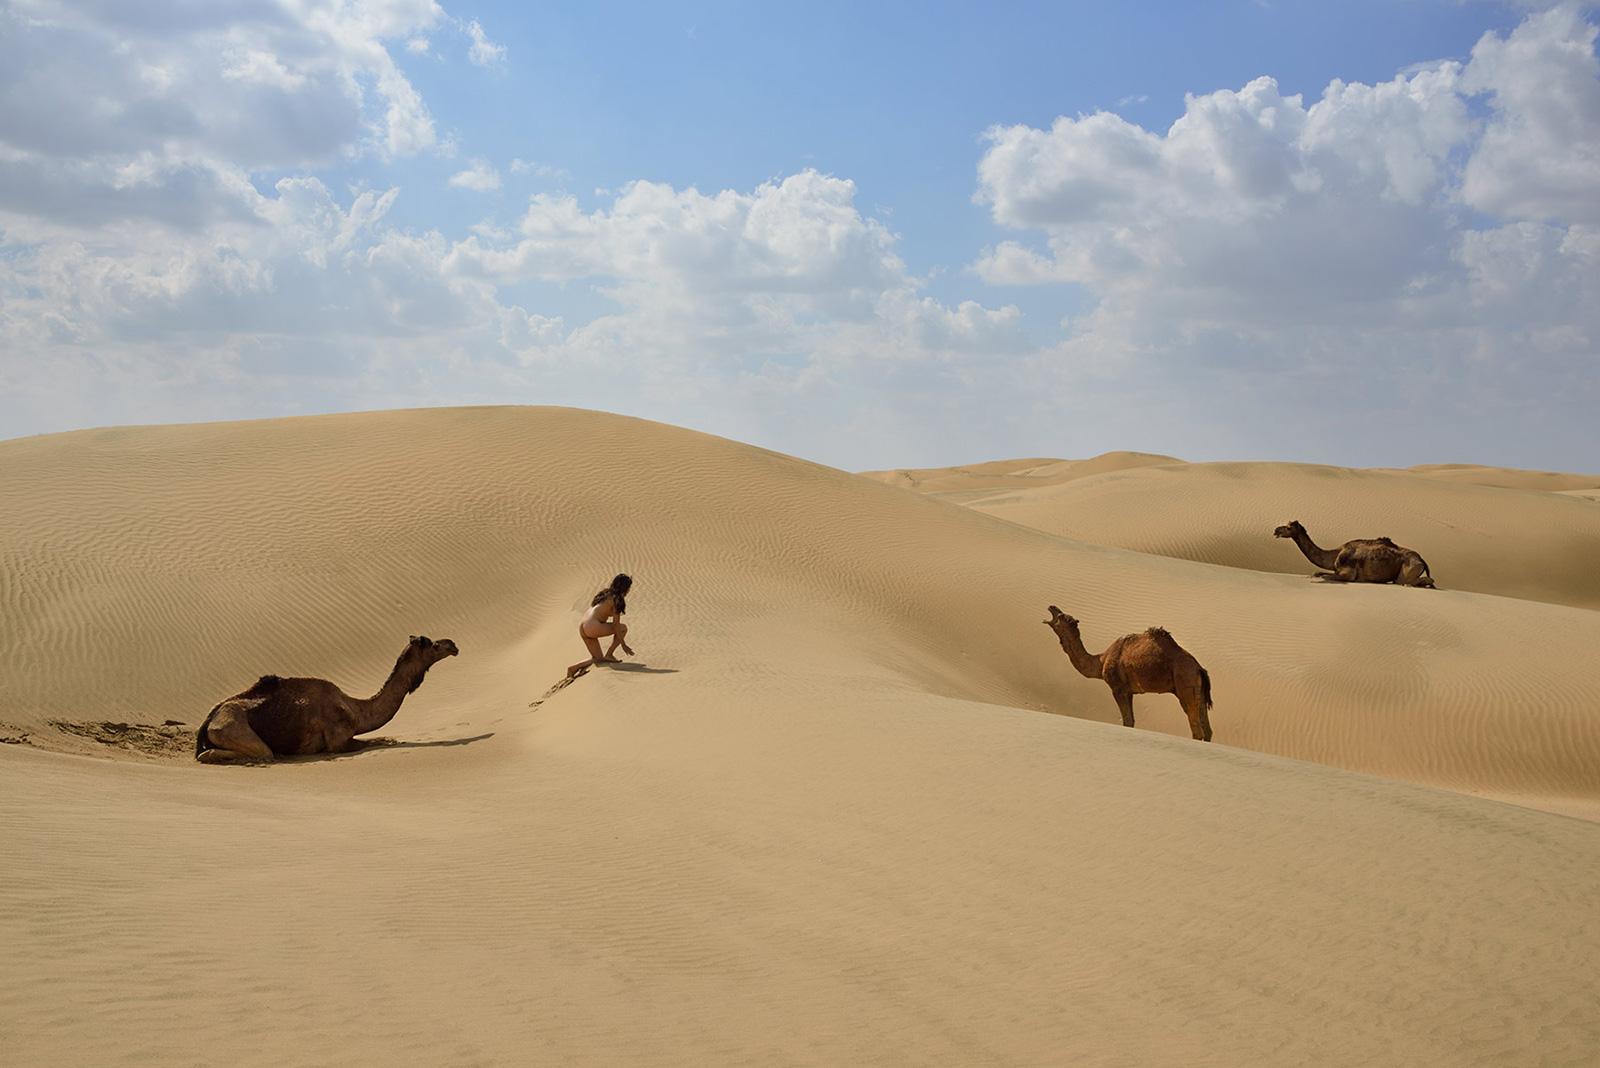 Siyala Dunes, <br>India, Thar Desert 1